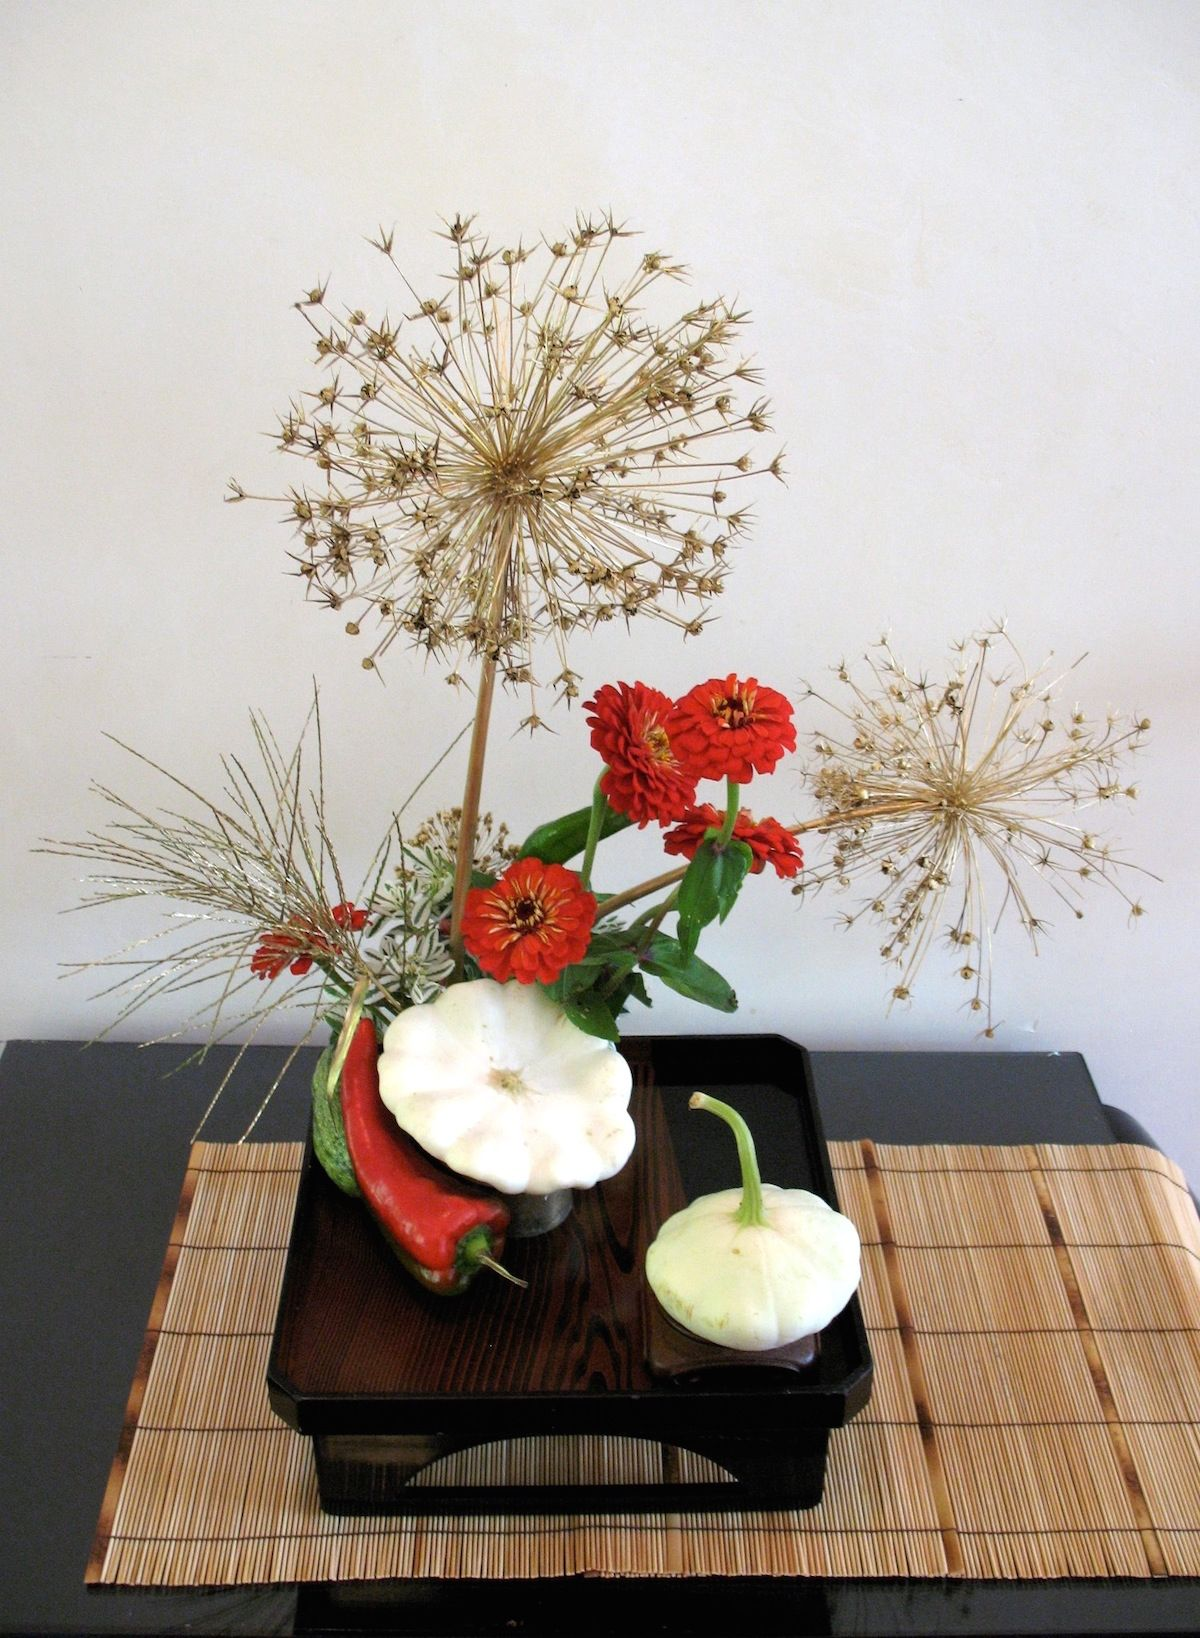 Morimono, Ikebana arrangement with fruits/vegetables by Lisa Stanley,  Sogetsu School